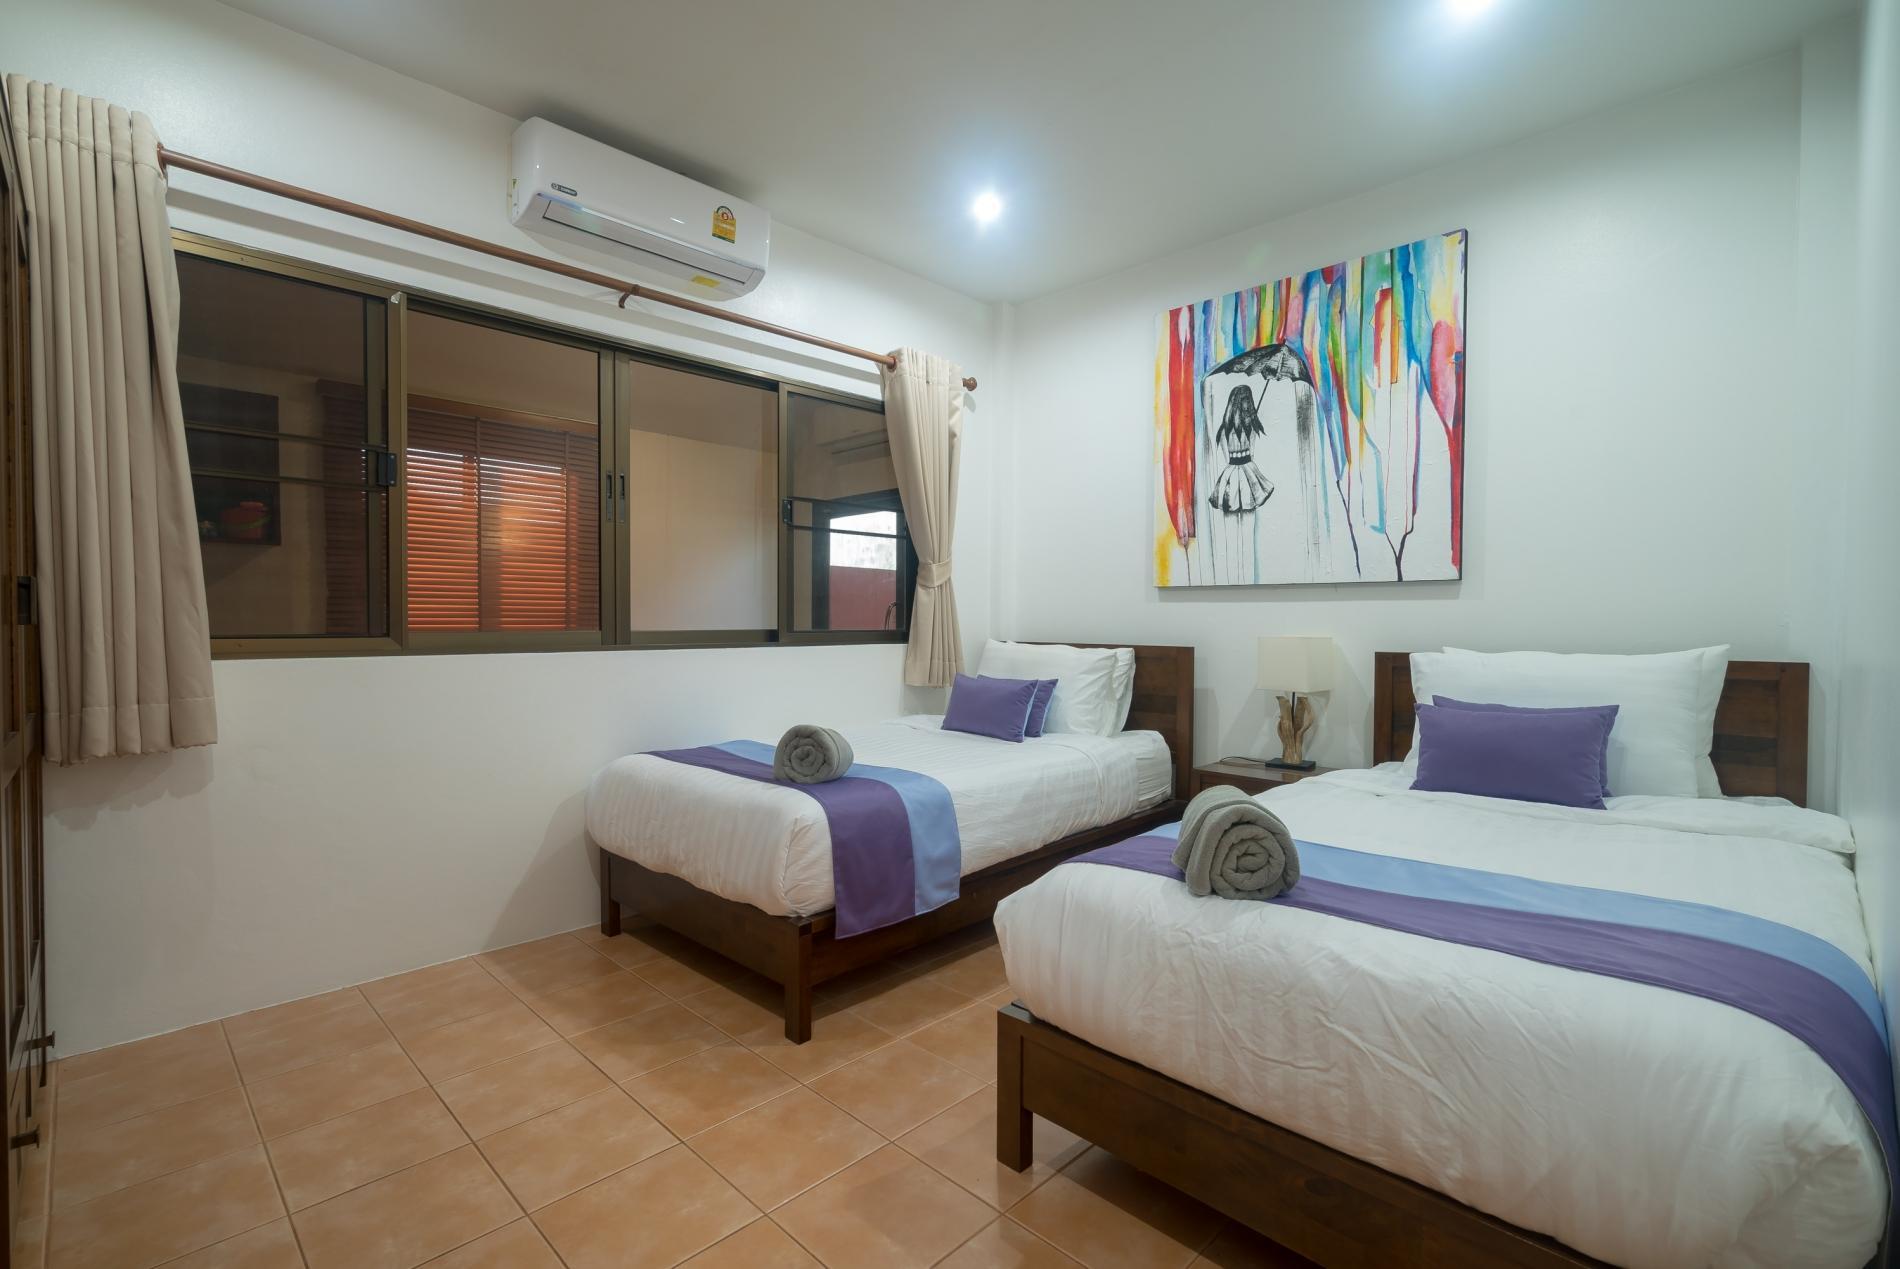 Pasak soi 3 - Convenient pool villa in quiet location, near Laguna, Boat avenue photo 5752030